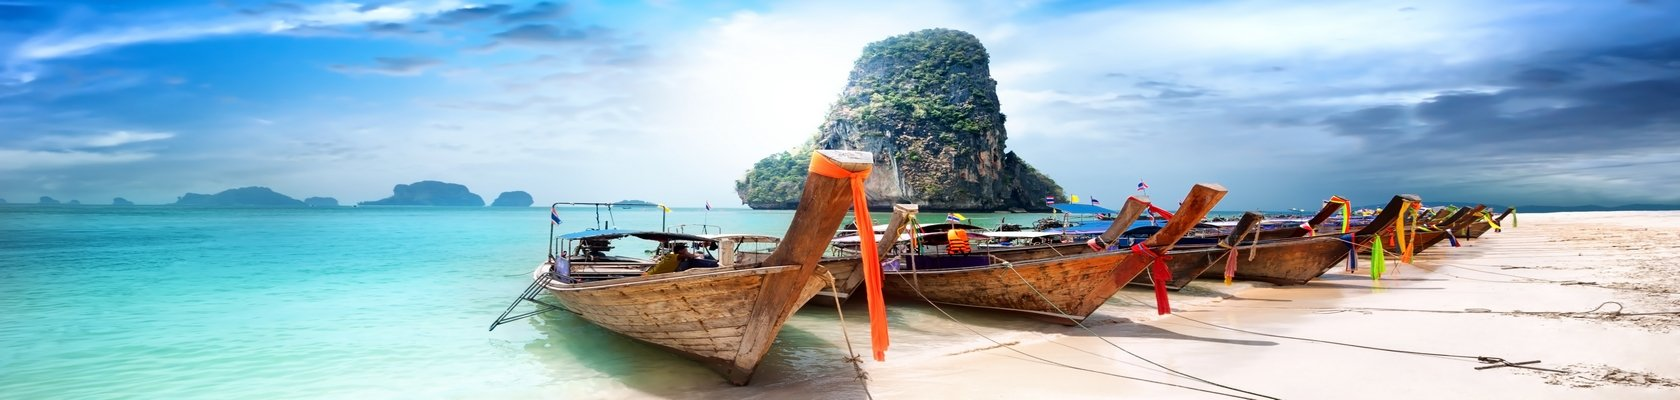 Tropisch Phuket